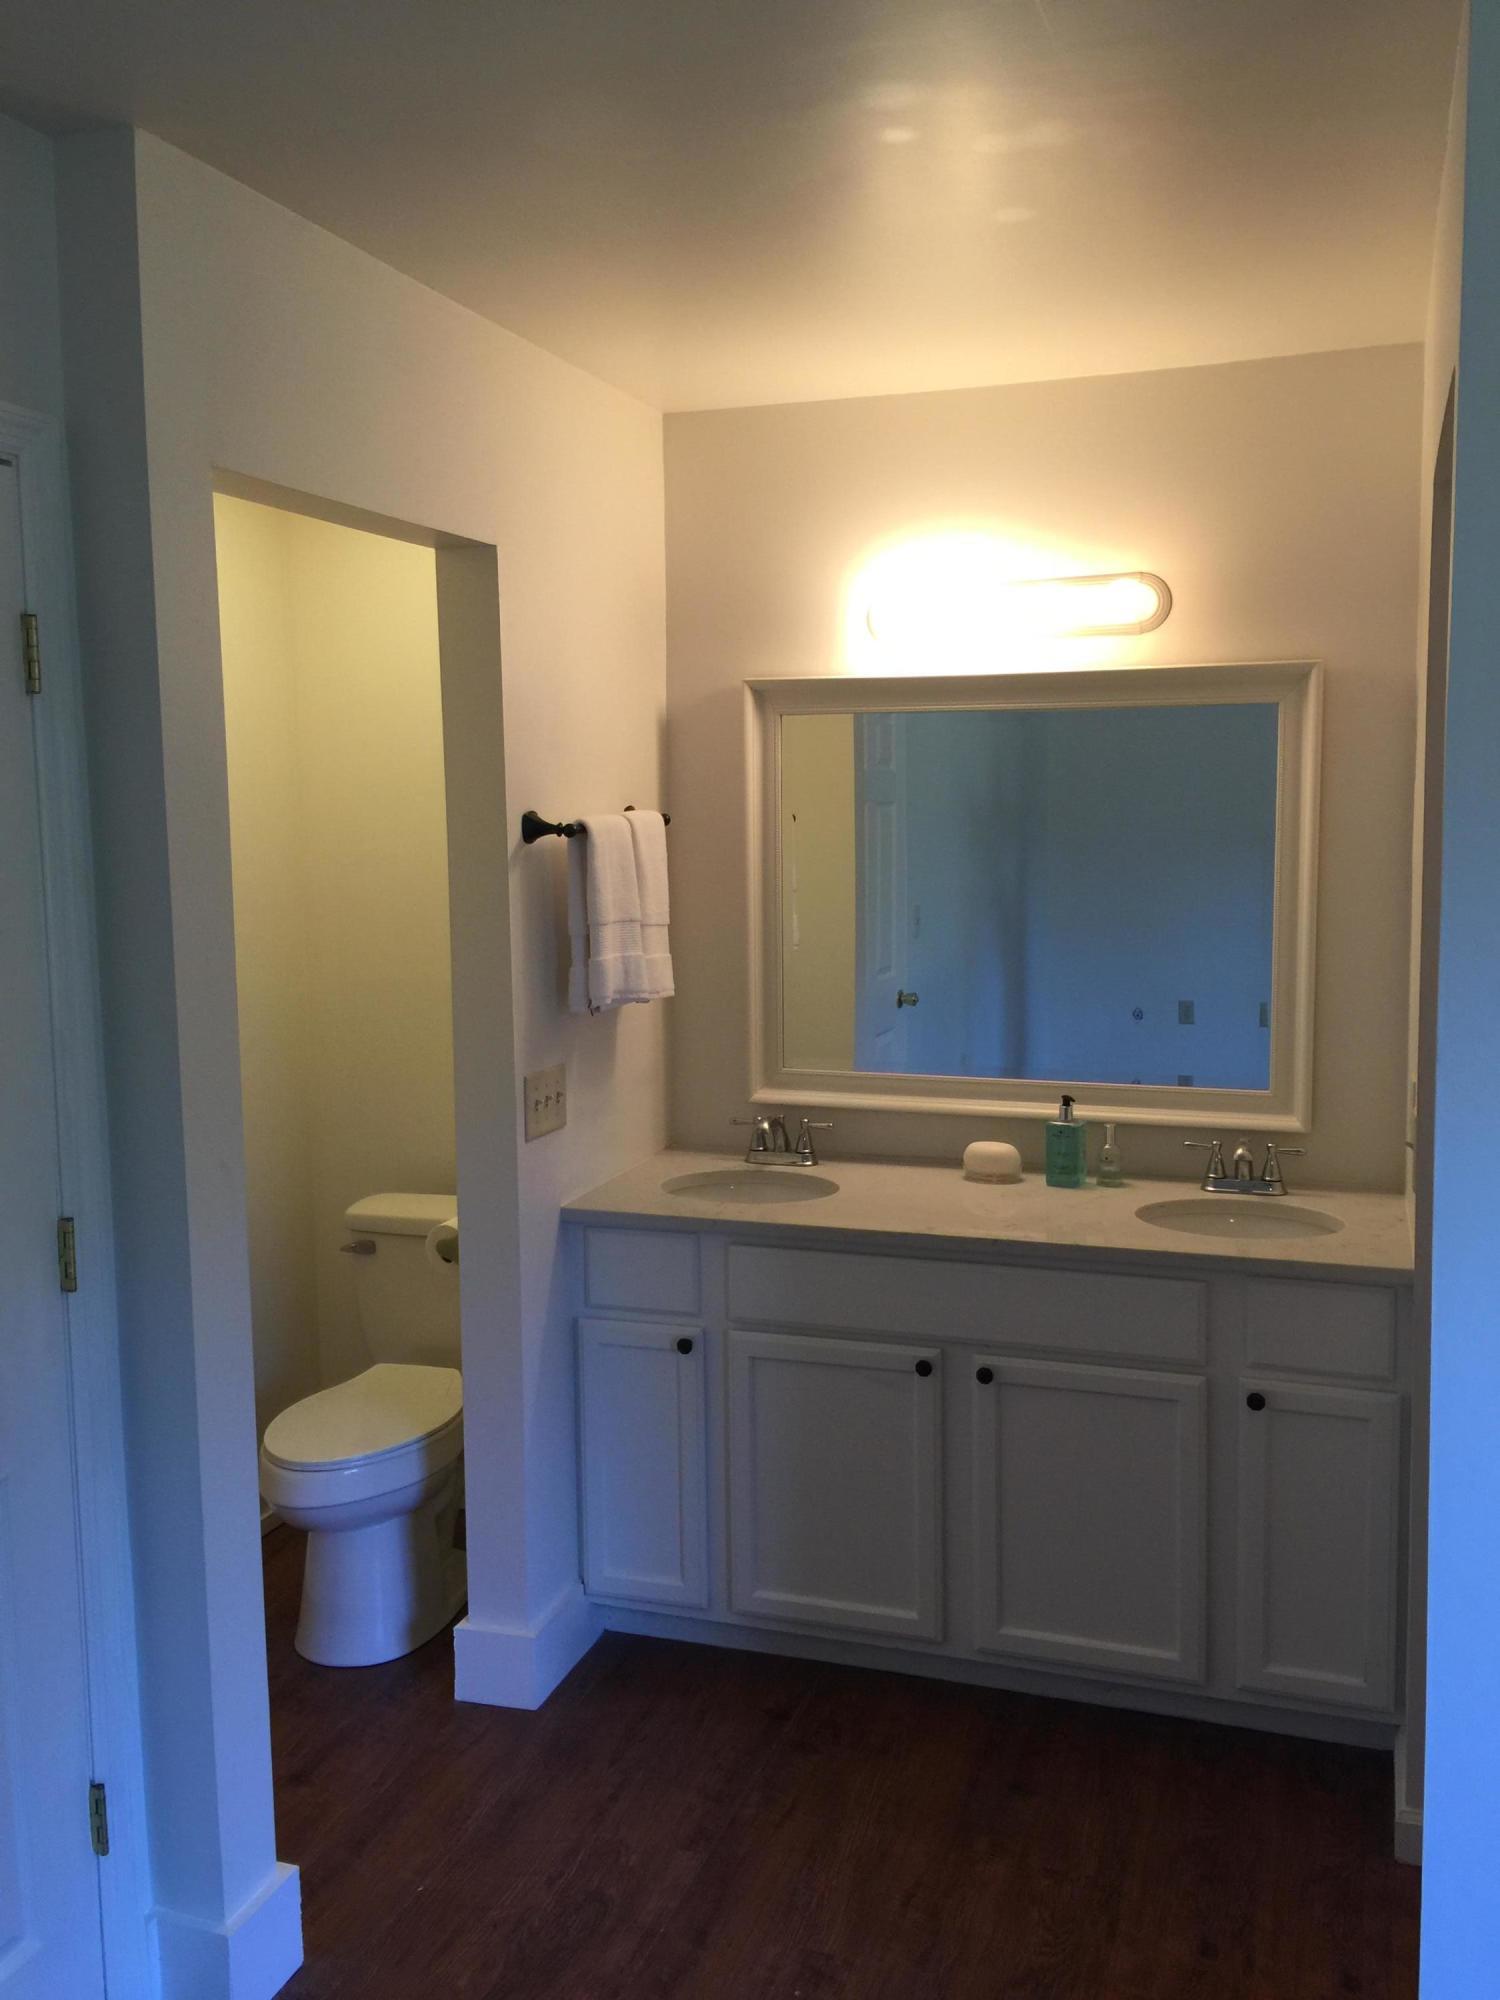 Quail Run Homes For Sale - 1202 Chicorie, Charleston, SC - 27